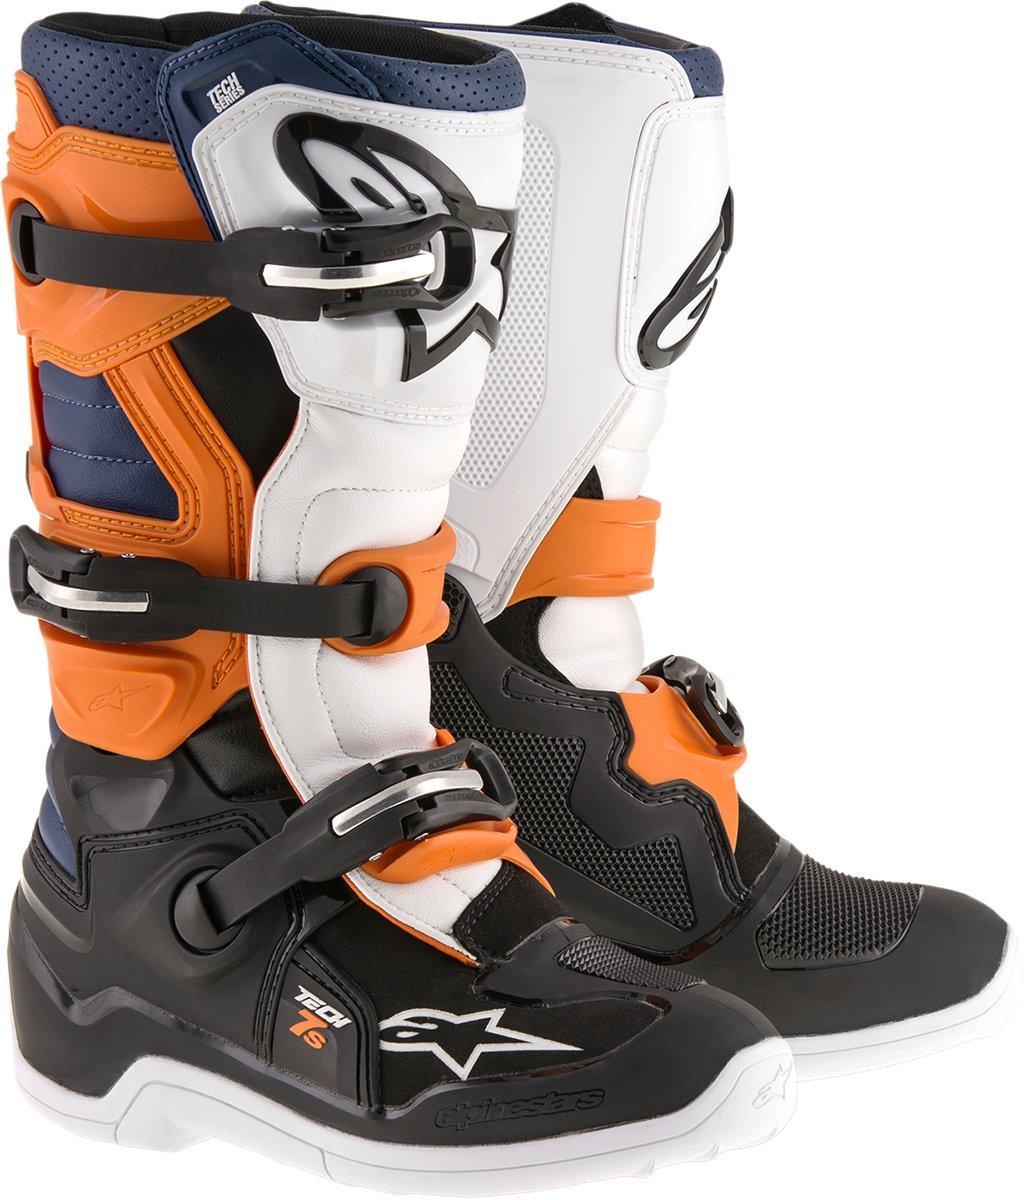 Alpinestars Unisex-Child Tech 7S Youth Boots (Black/Orange/Blue, Size 3)